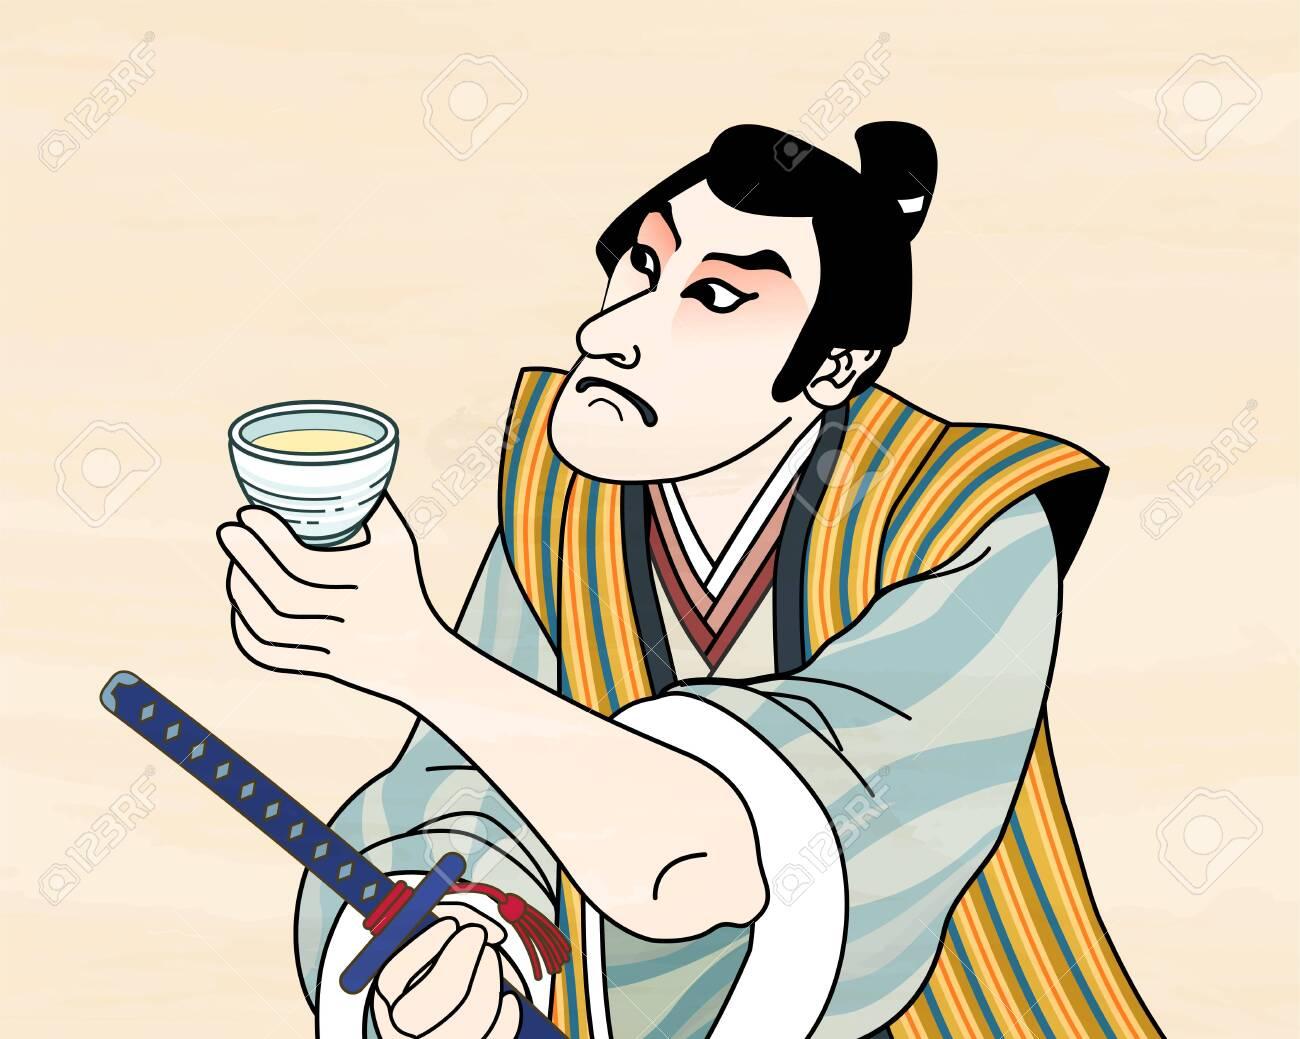 Ukiyo e style kabuki actor enjoying sake - 127824542